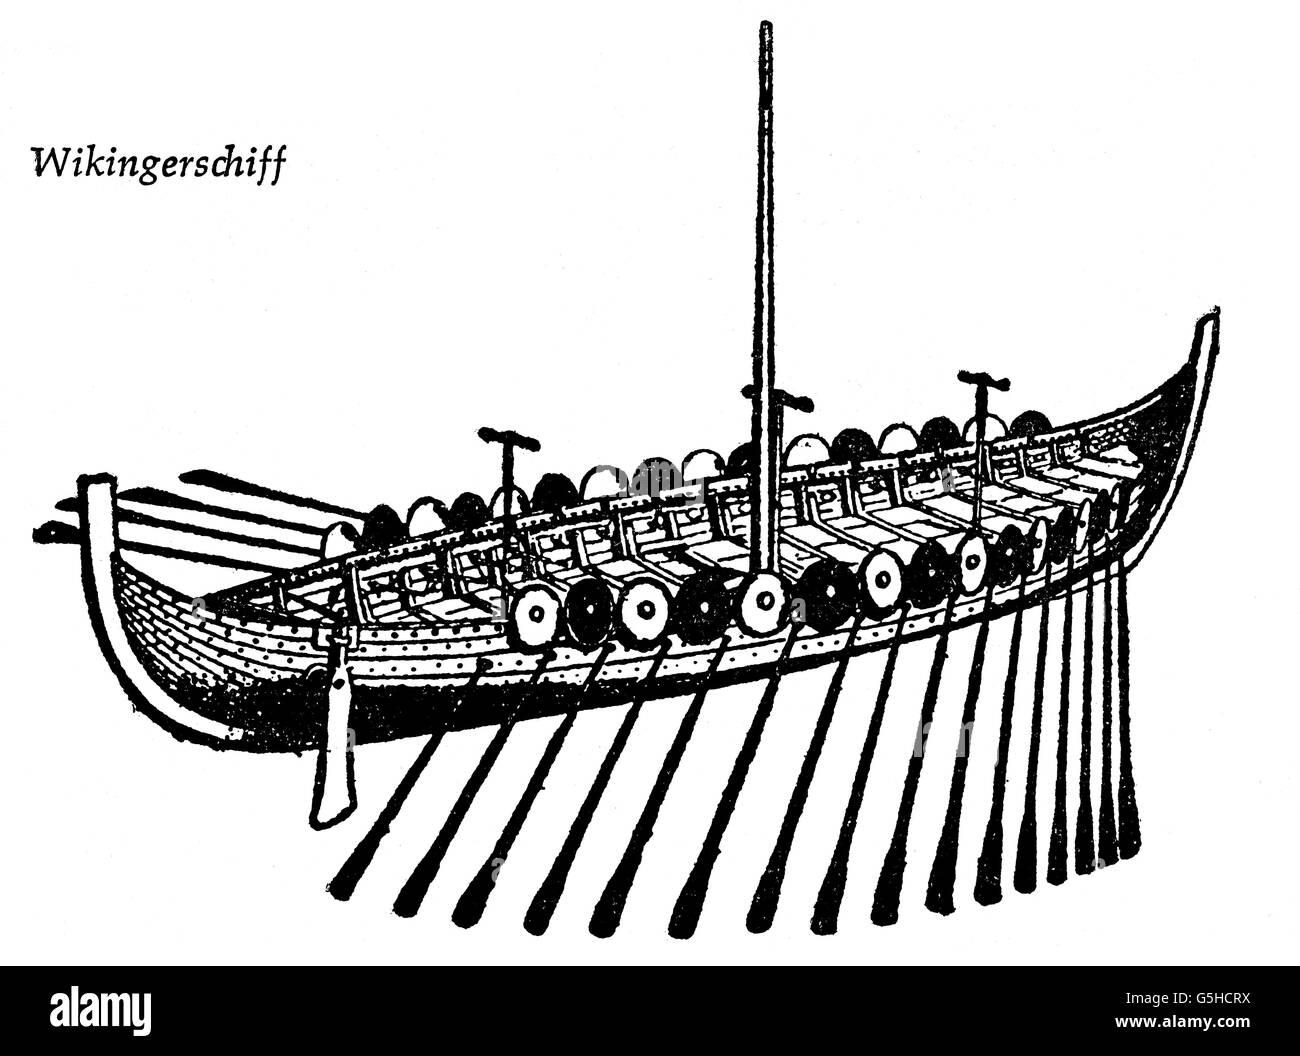 transport / transportation, navigation, Viking, Viking ship, 9th / 10th century, drawing, 20th century, ship, ships, - Stock Image